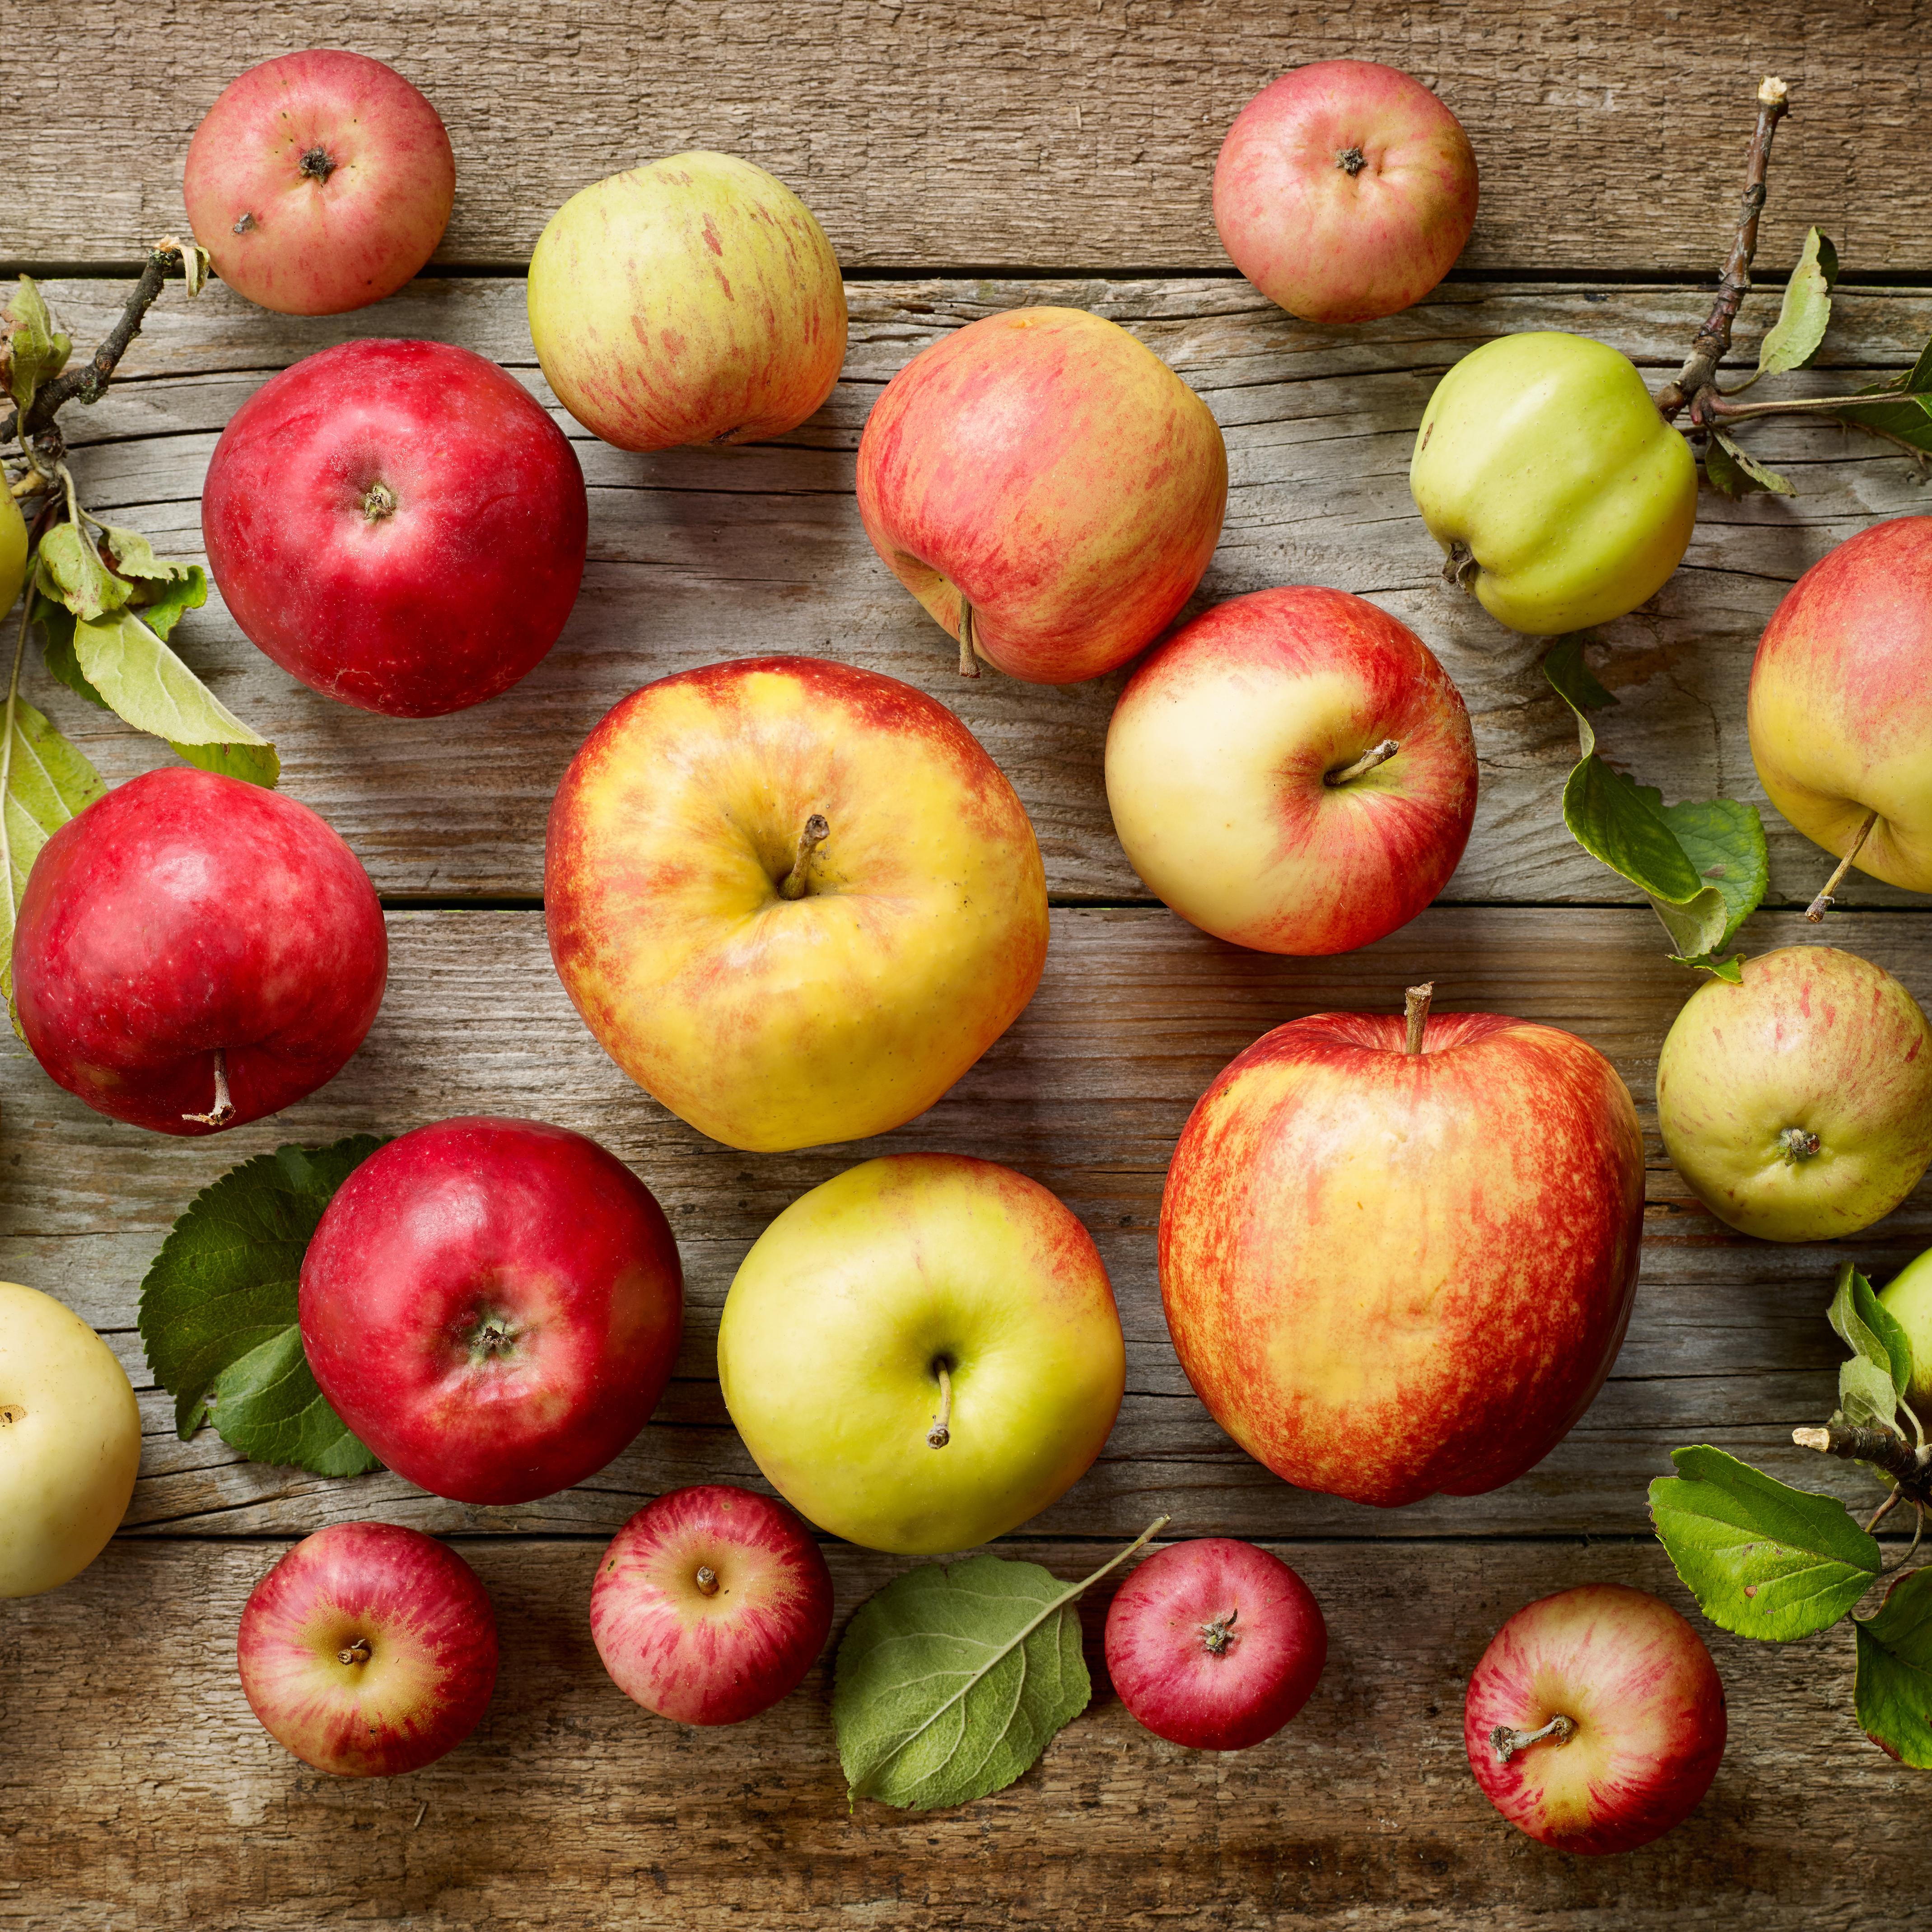 The health benefits of apples | BBC Good Food